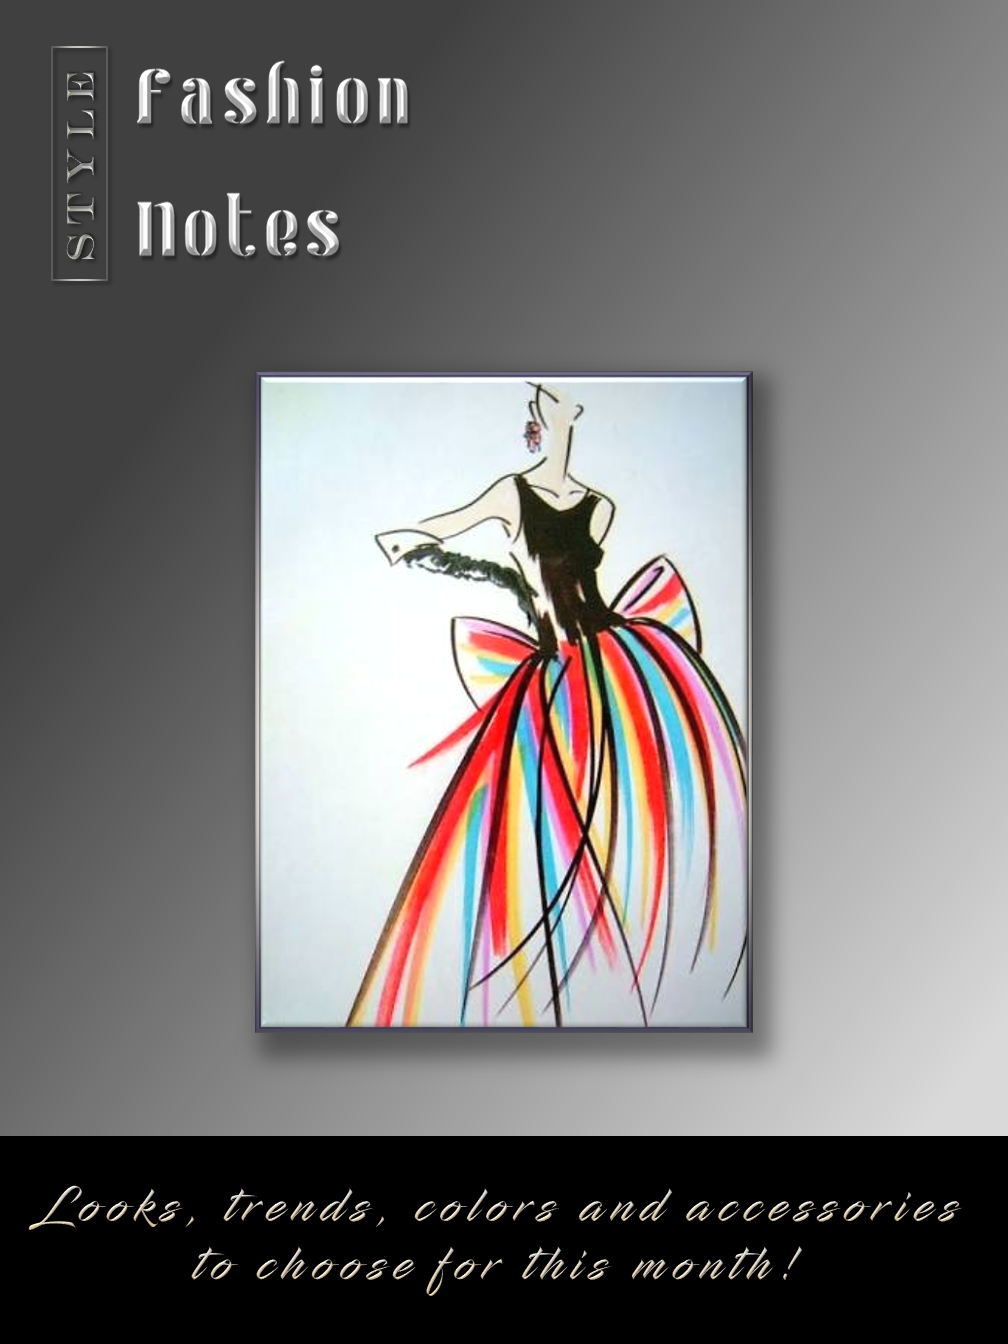 Fashion Notes!